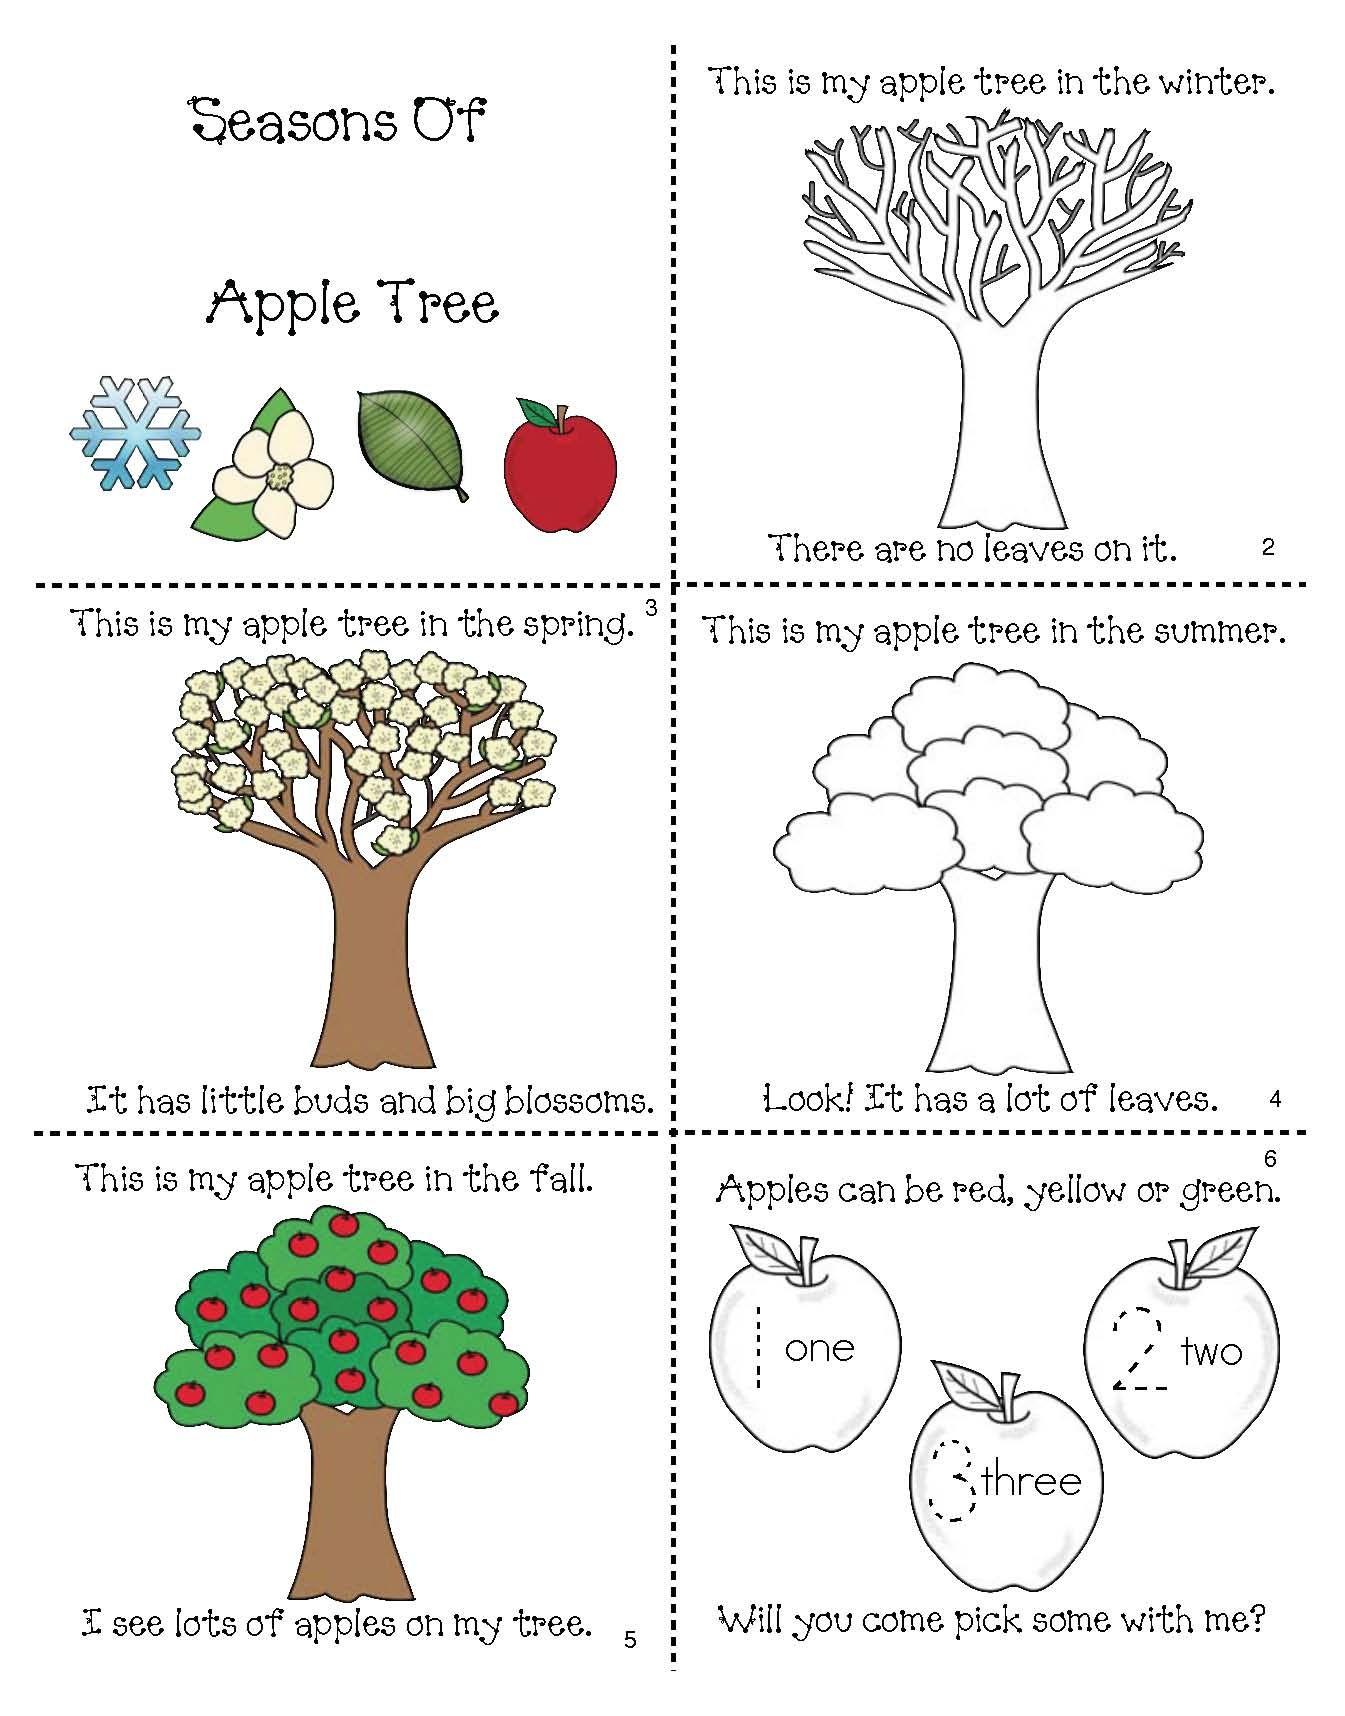 The 4 Seasons Of My Apple Tree